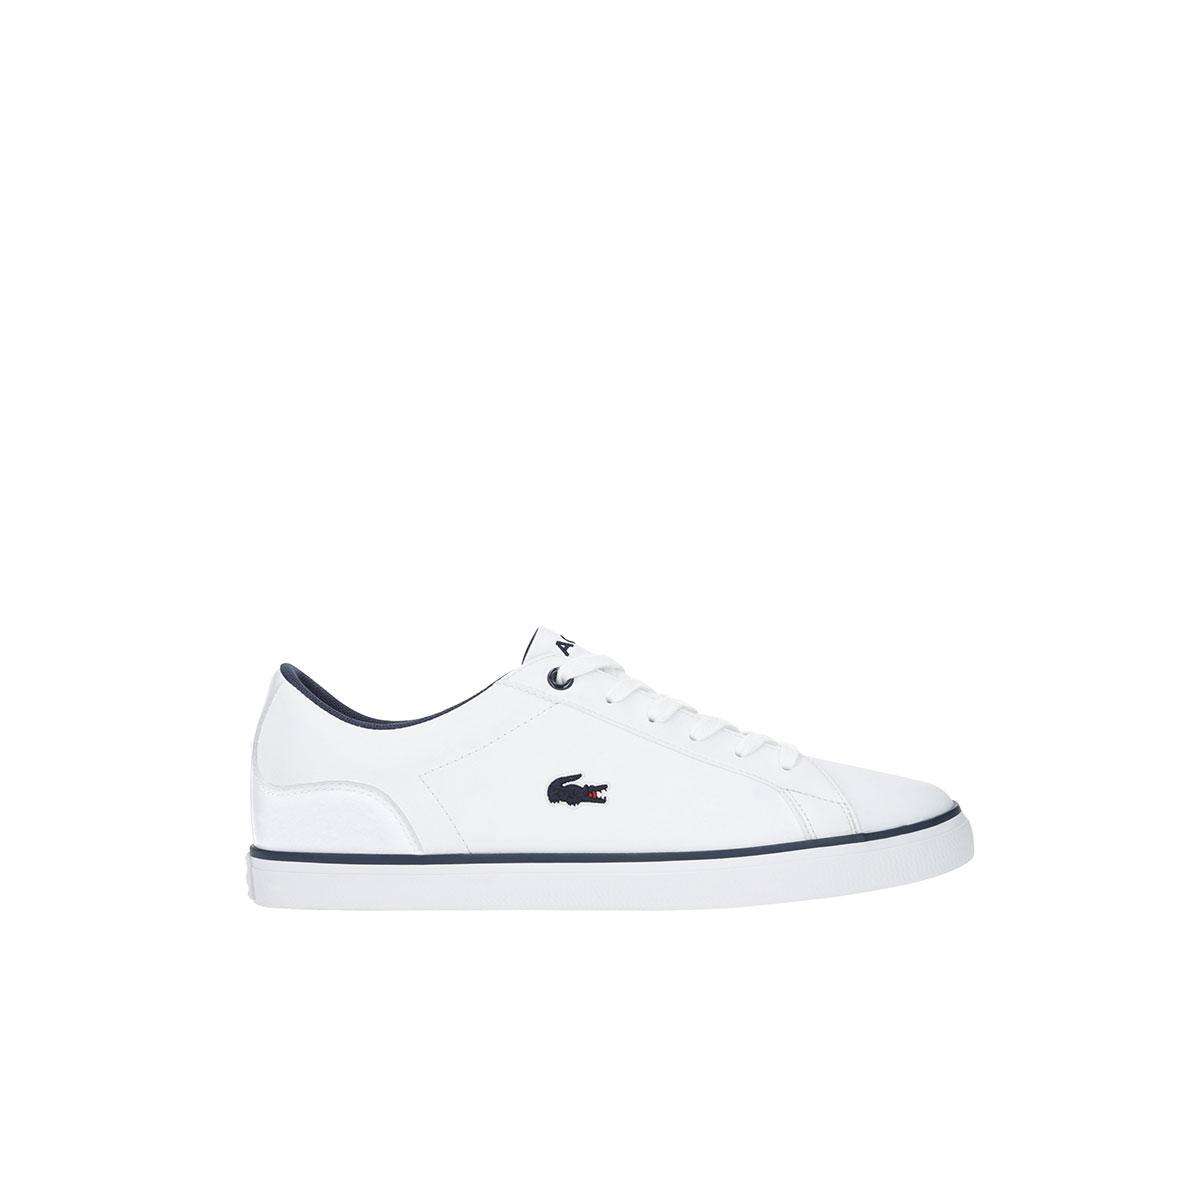 נעלי נערים | Lerond Bl 2